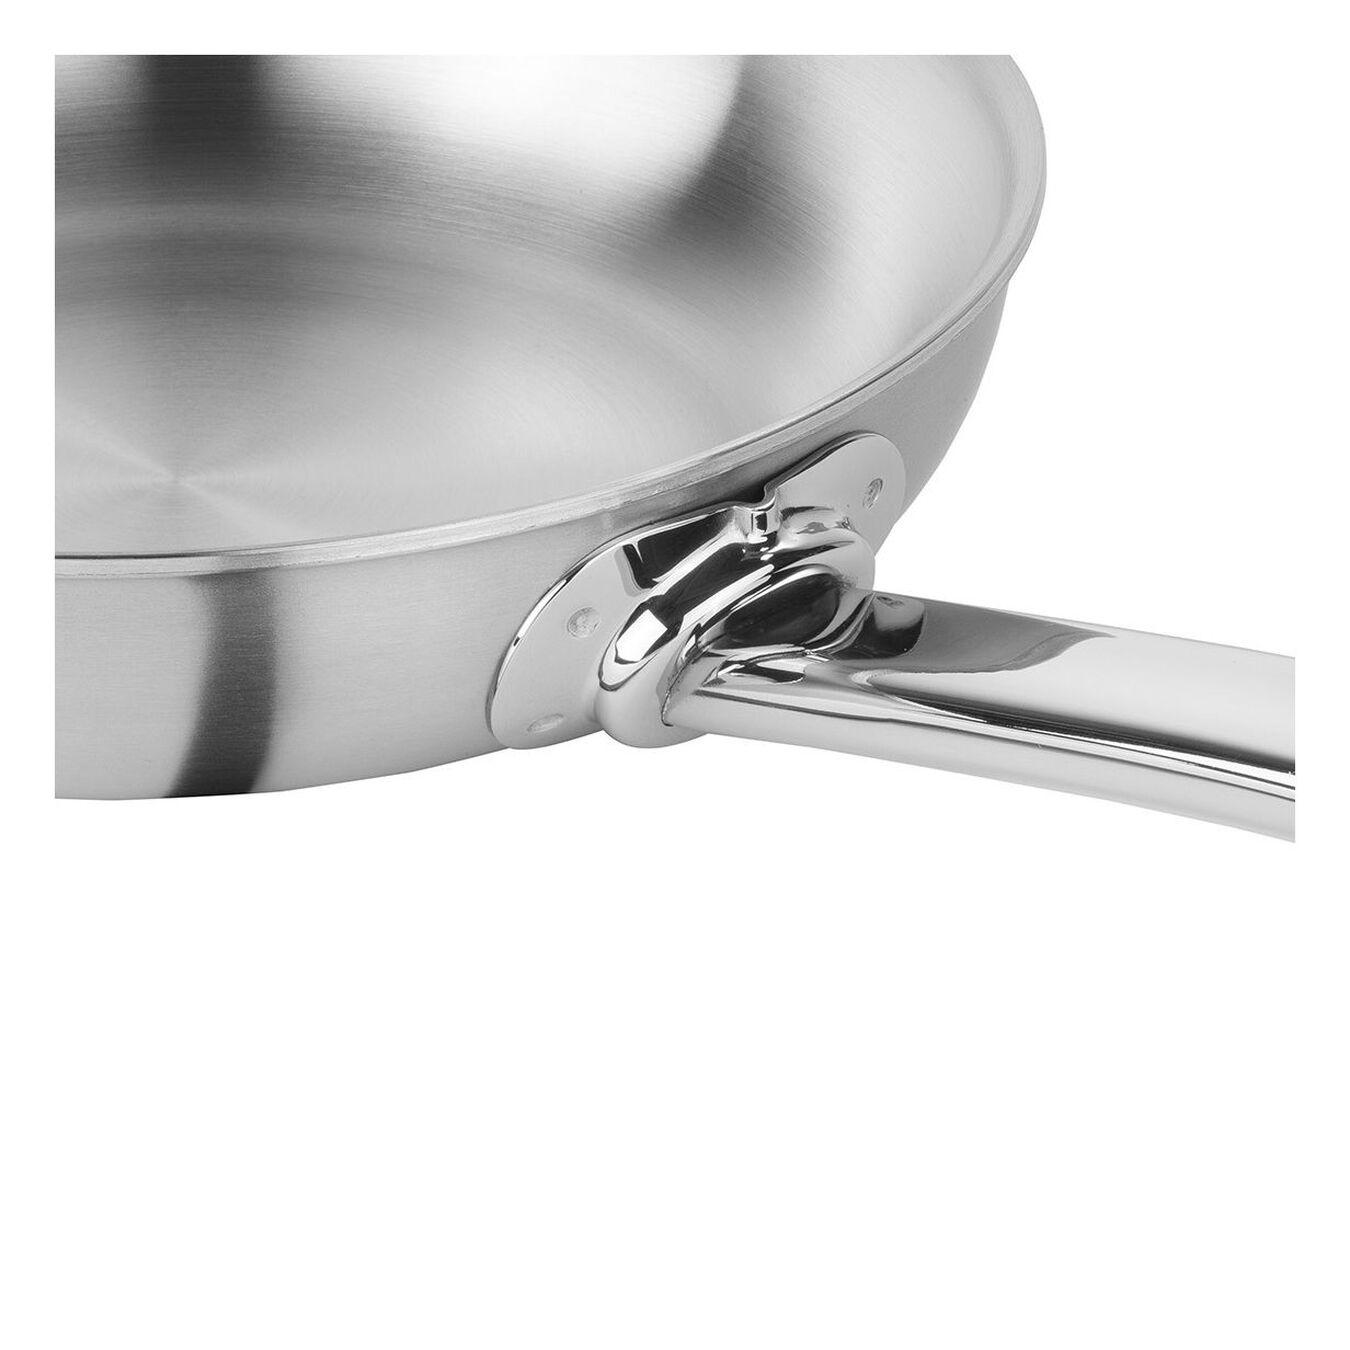 Bratpfanne 20 cm, 18/10 Edelstahl, Silber,,large 3